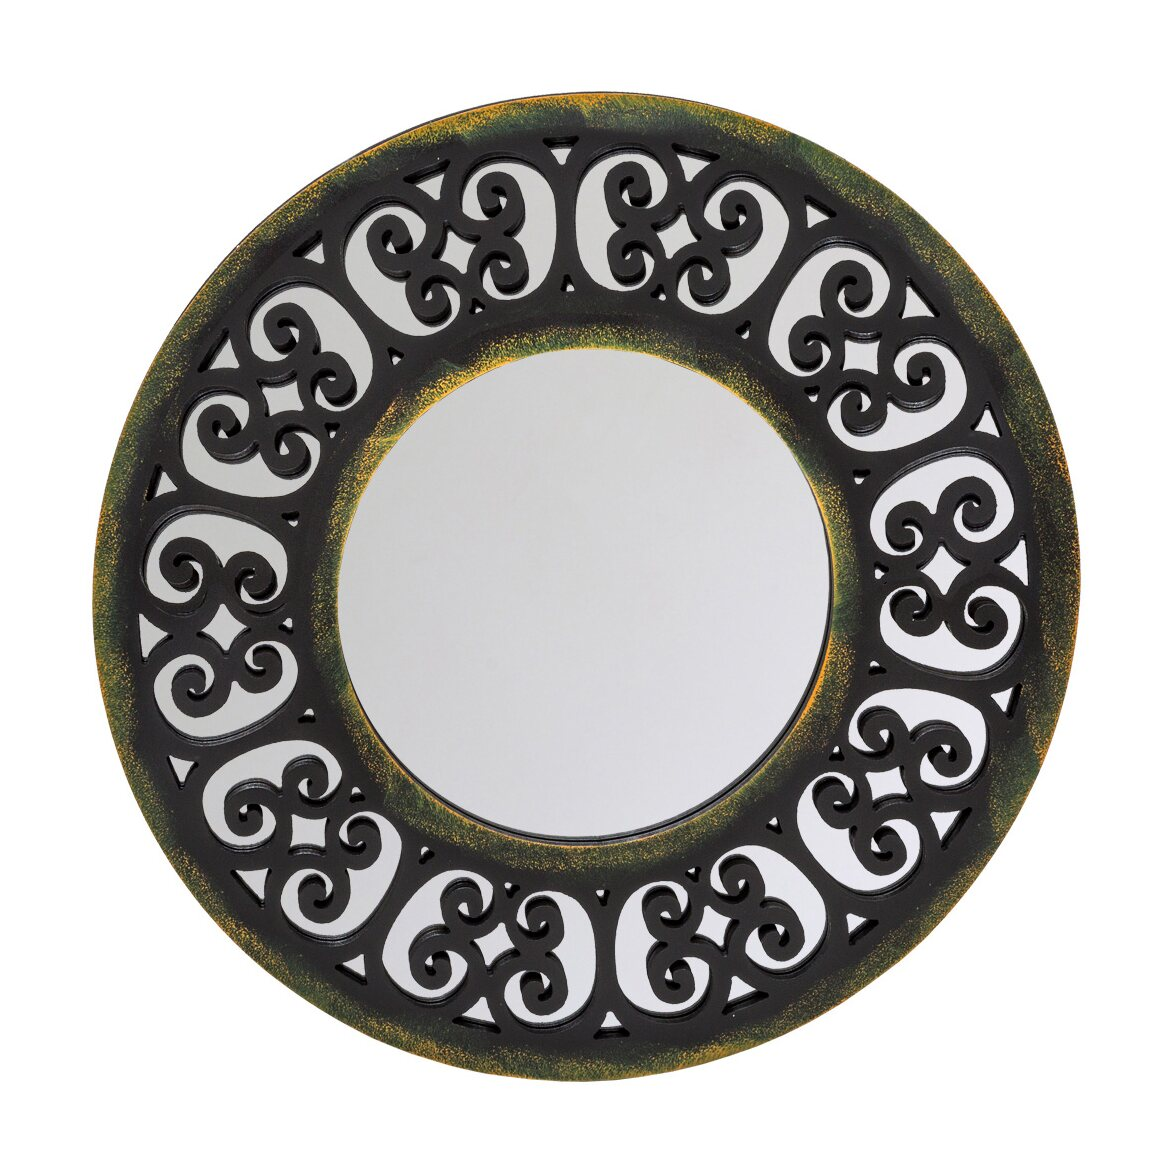 Настенное зеркало «Бомбей» | Настенные зеркала Kingsby